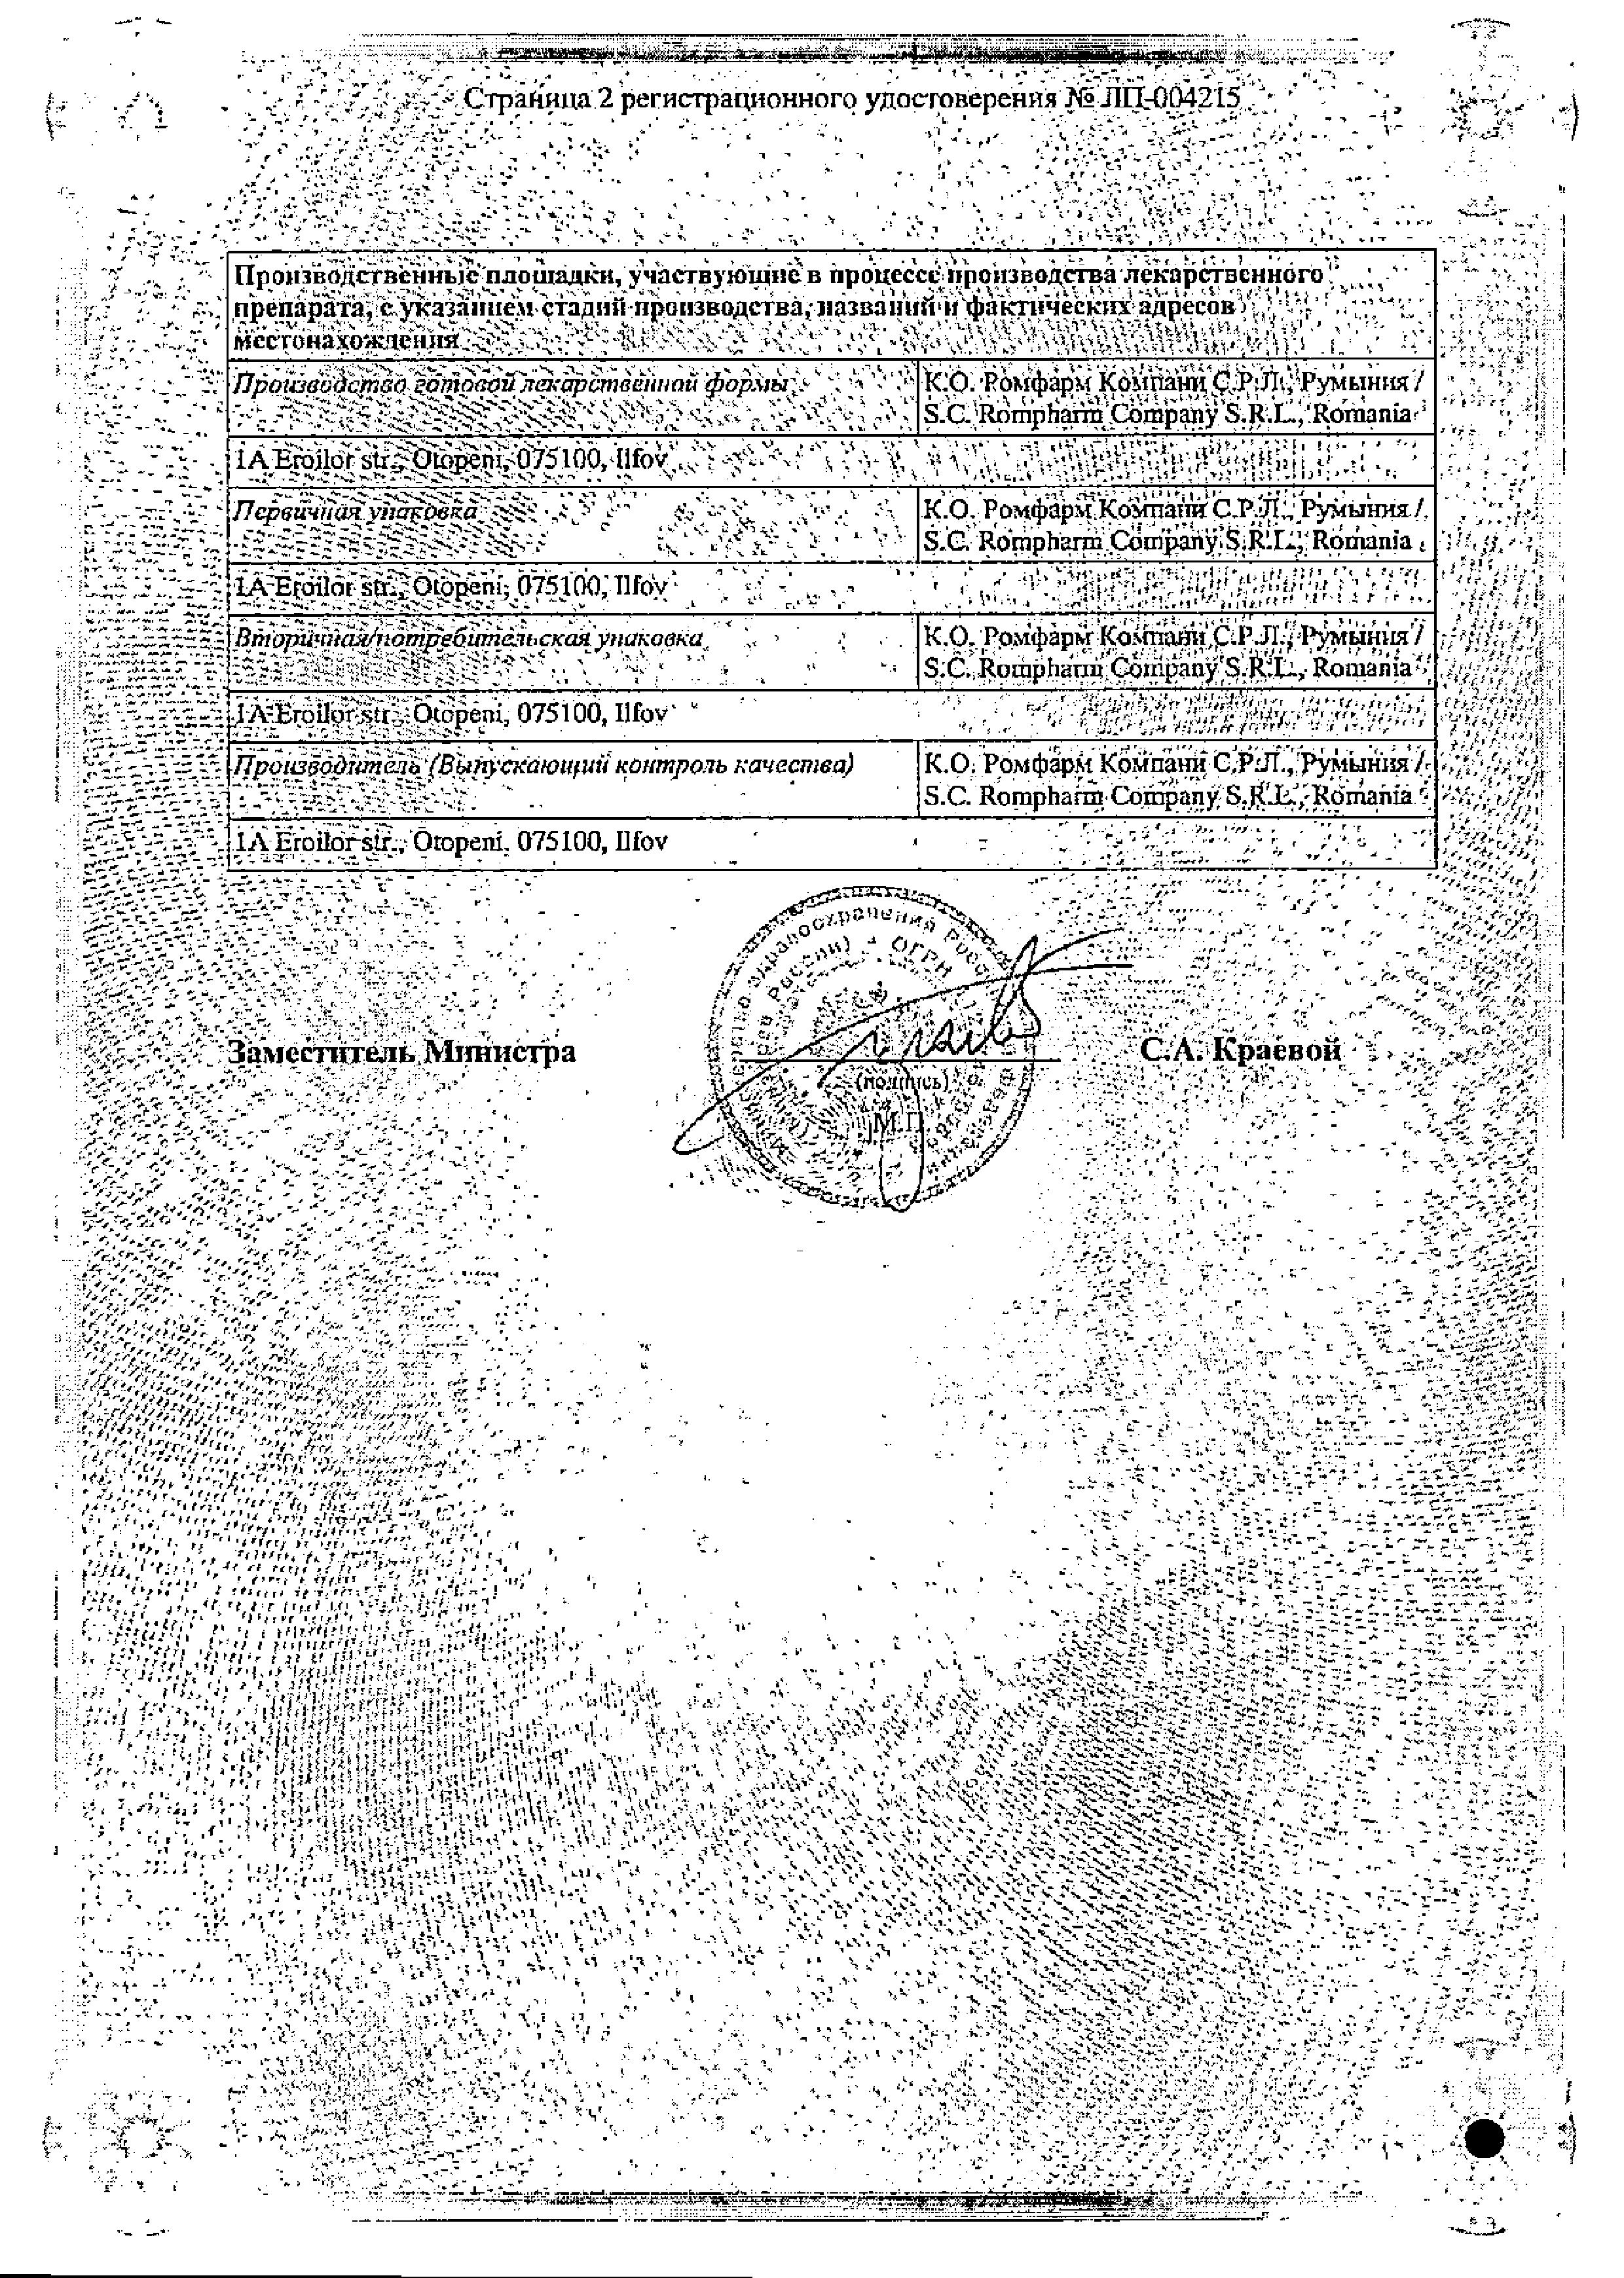 Олопаталлерг сертификат